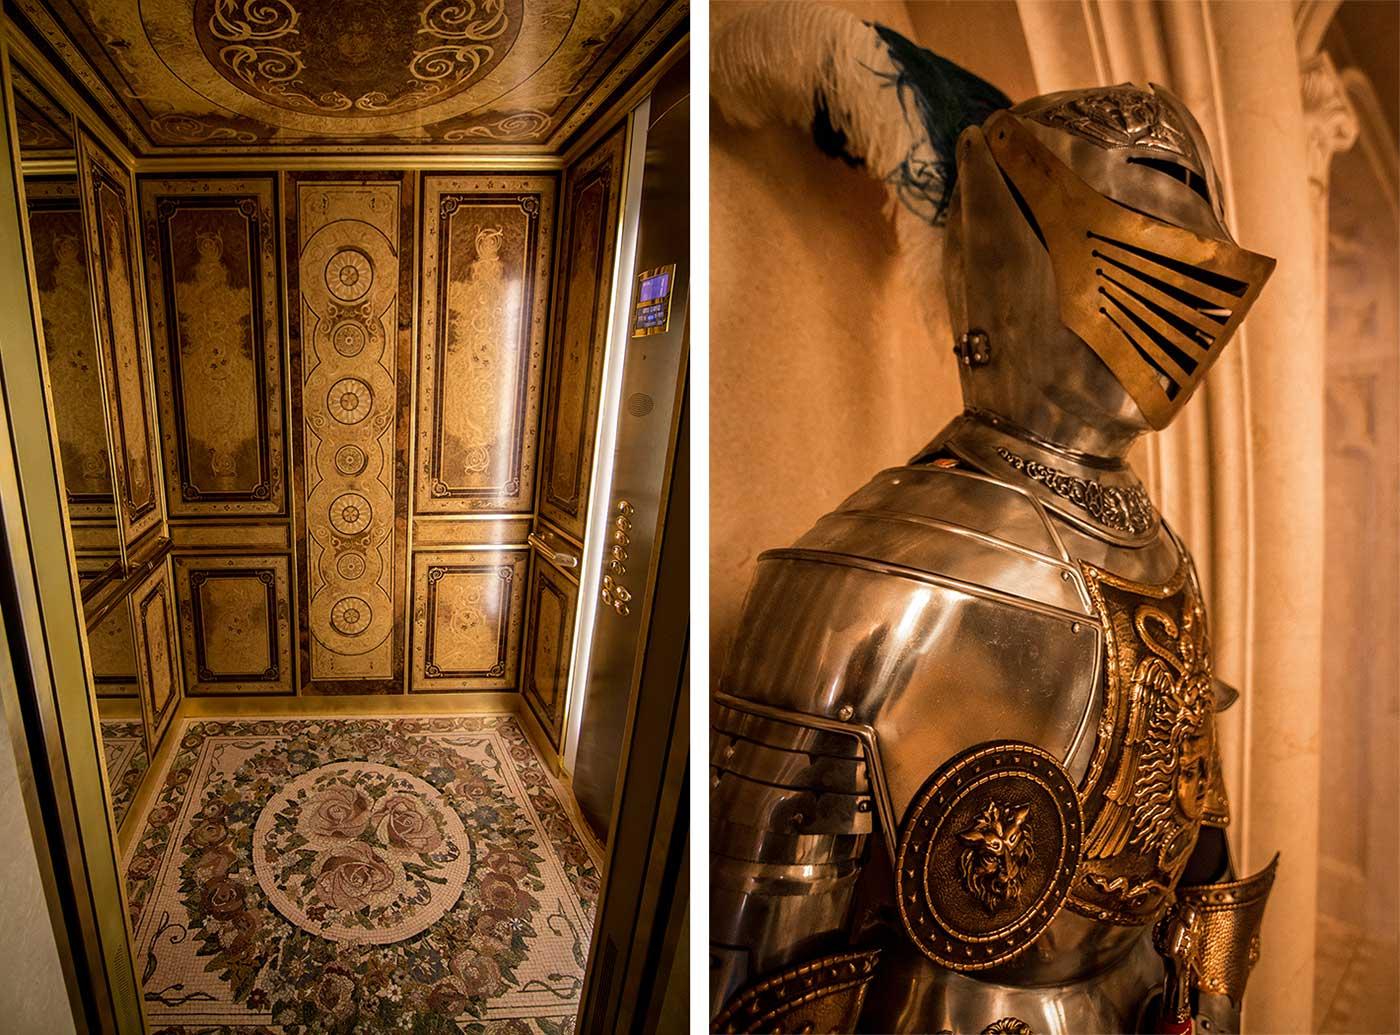 The jewel-encrusted, mosaic-floored elevator inside the Honka house. Mezhyhirya, Ukraine.